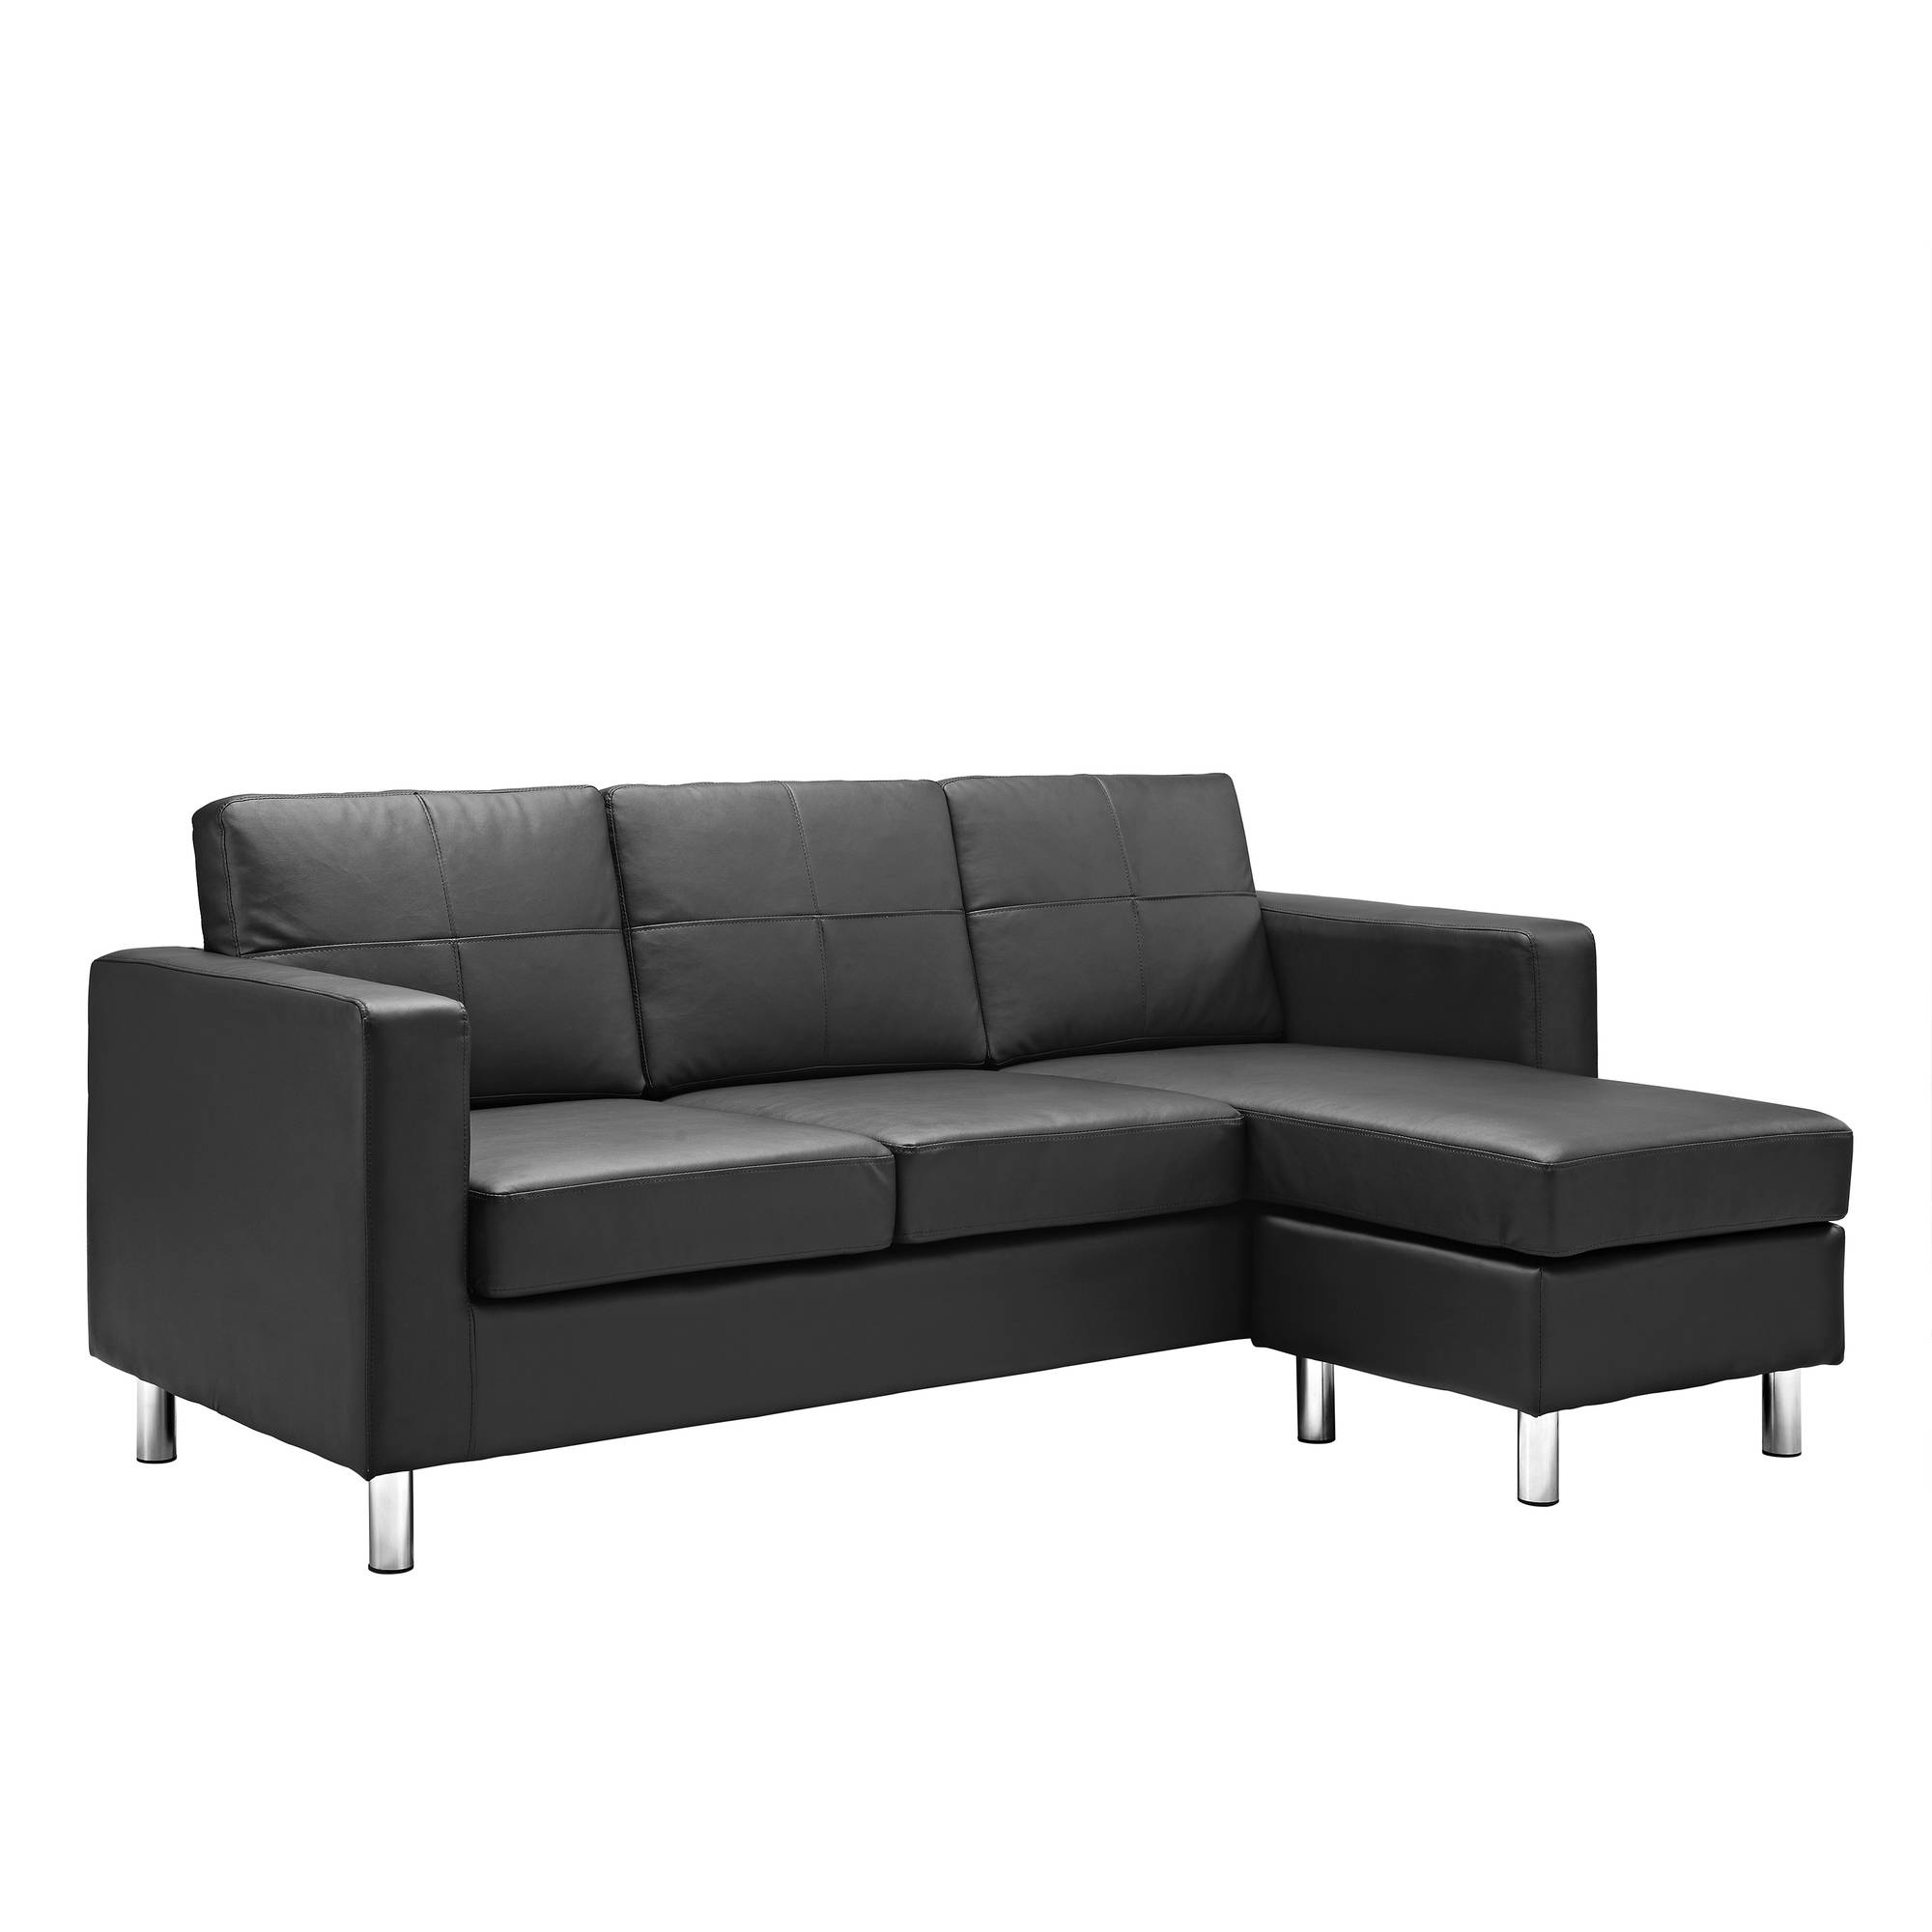 small sectional sofa dorel living small spaces configurable sectional sofa, multiple colors -  walmart.com GRNJNFH